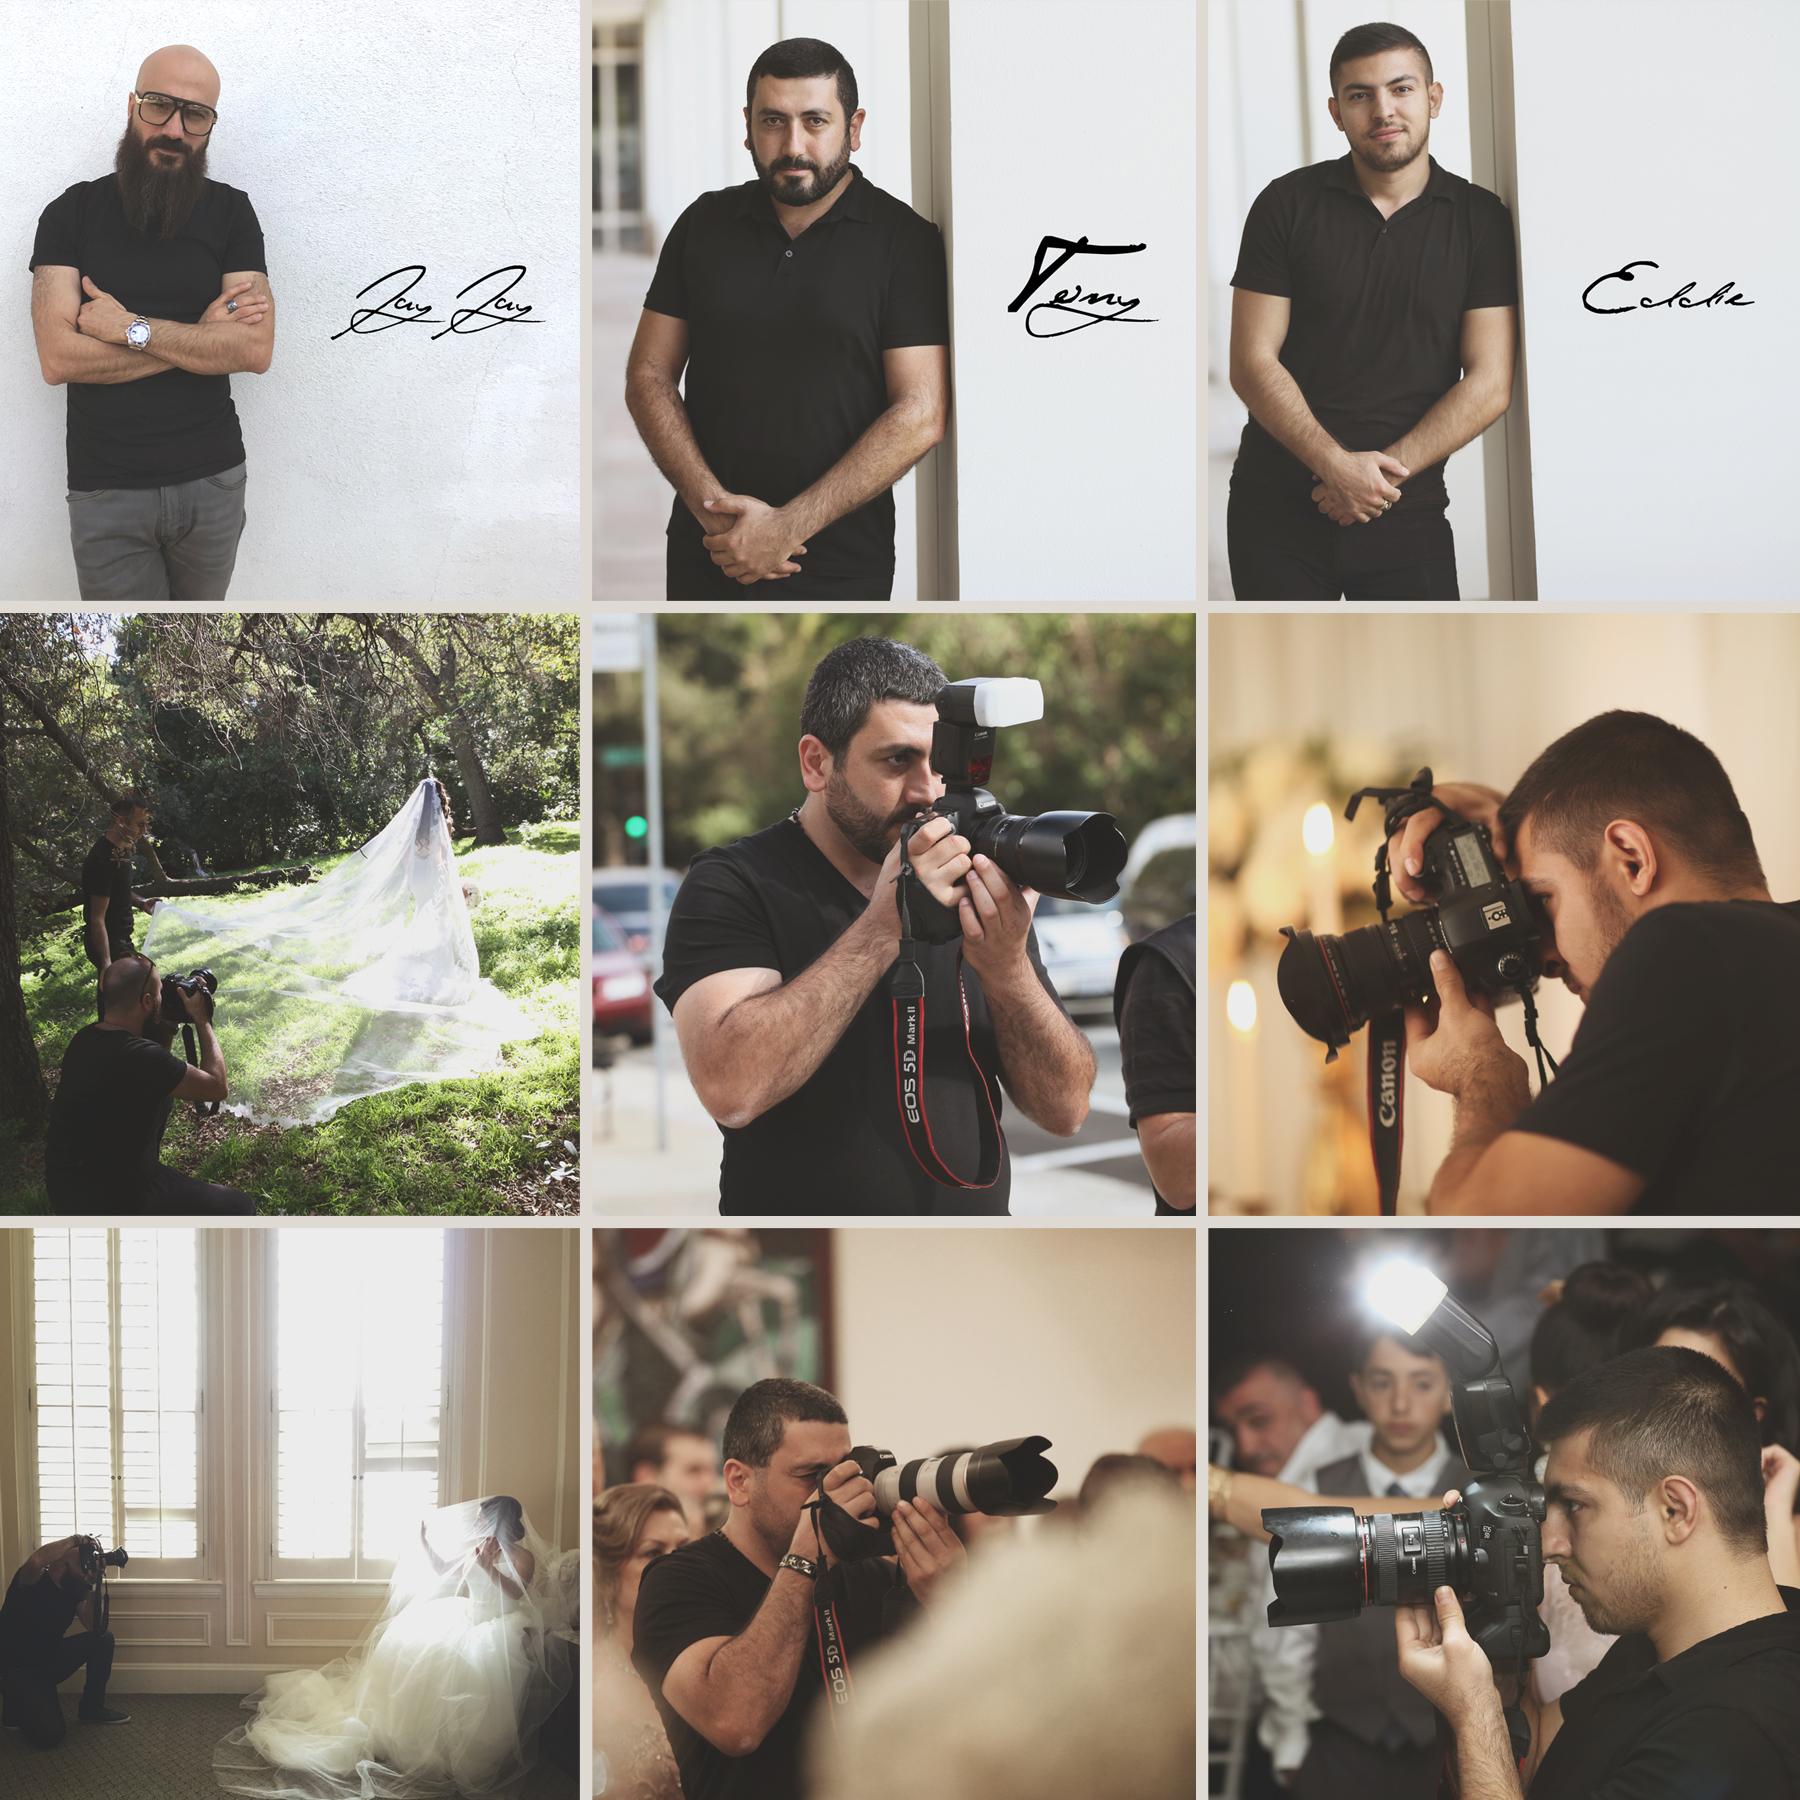 crew about copy.jpg